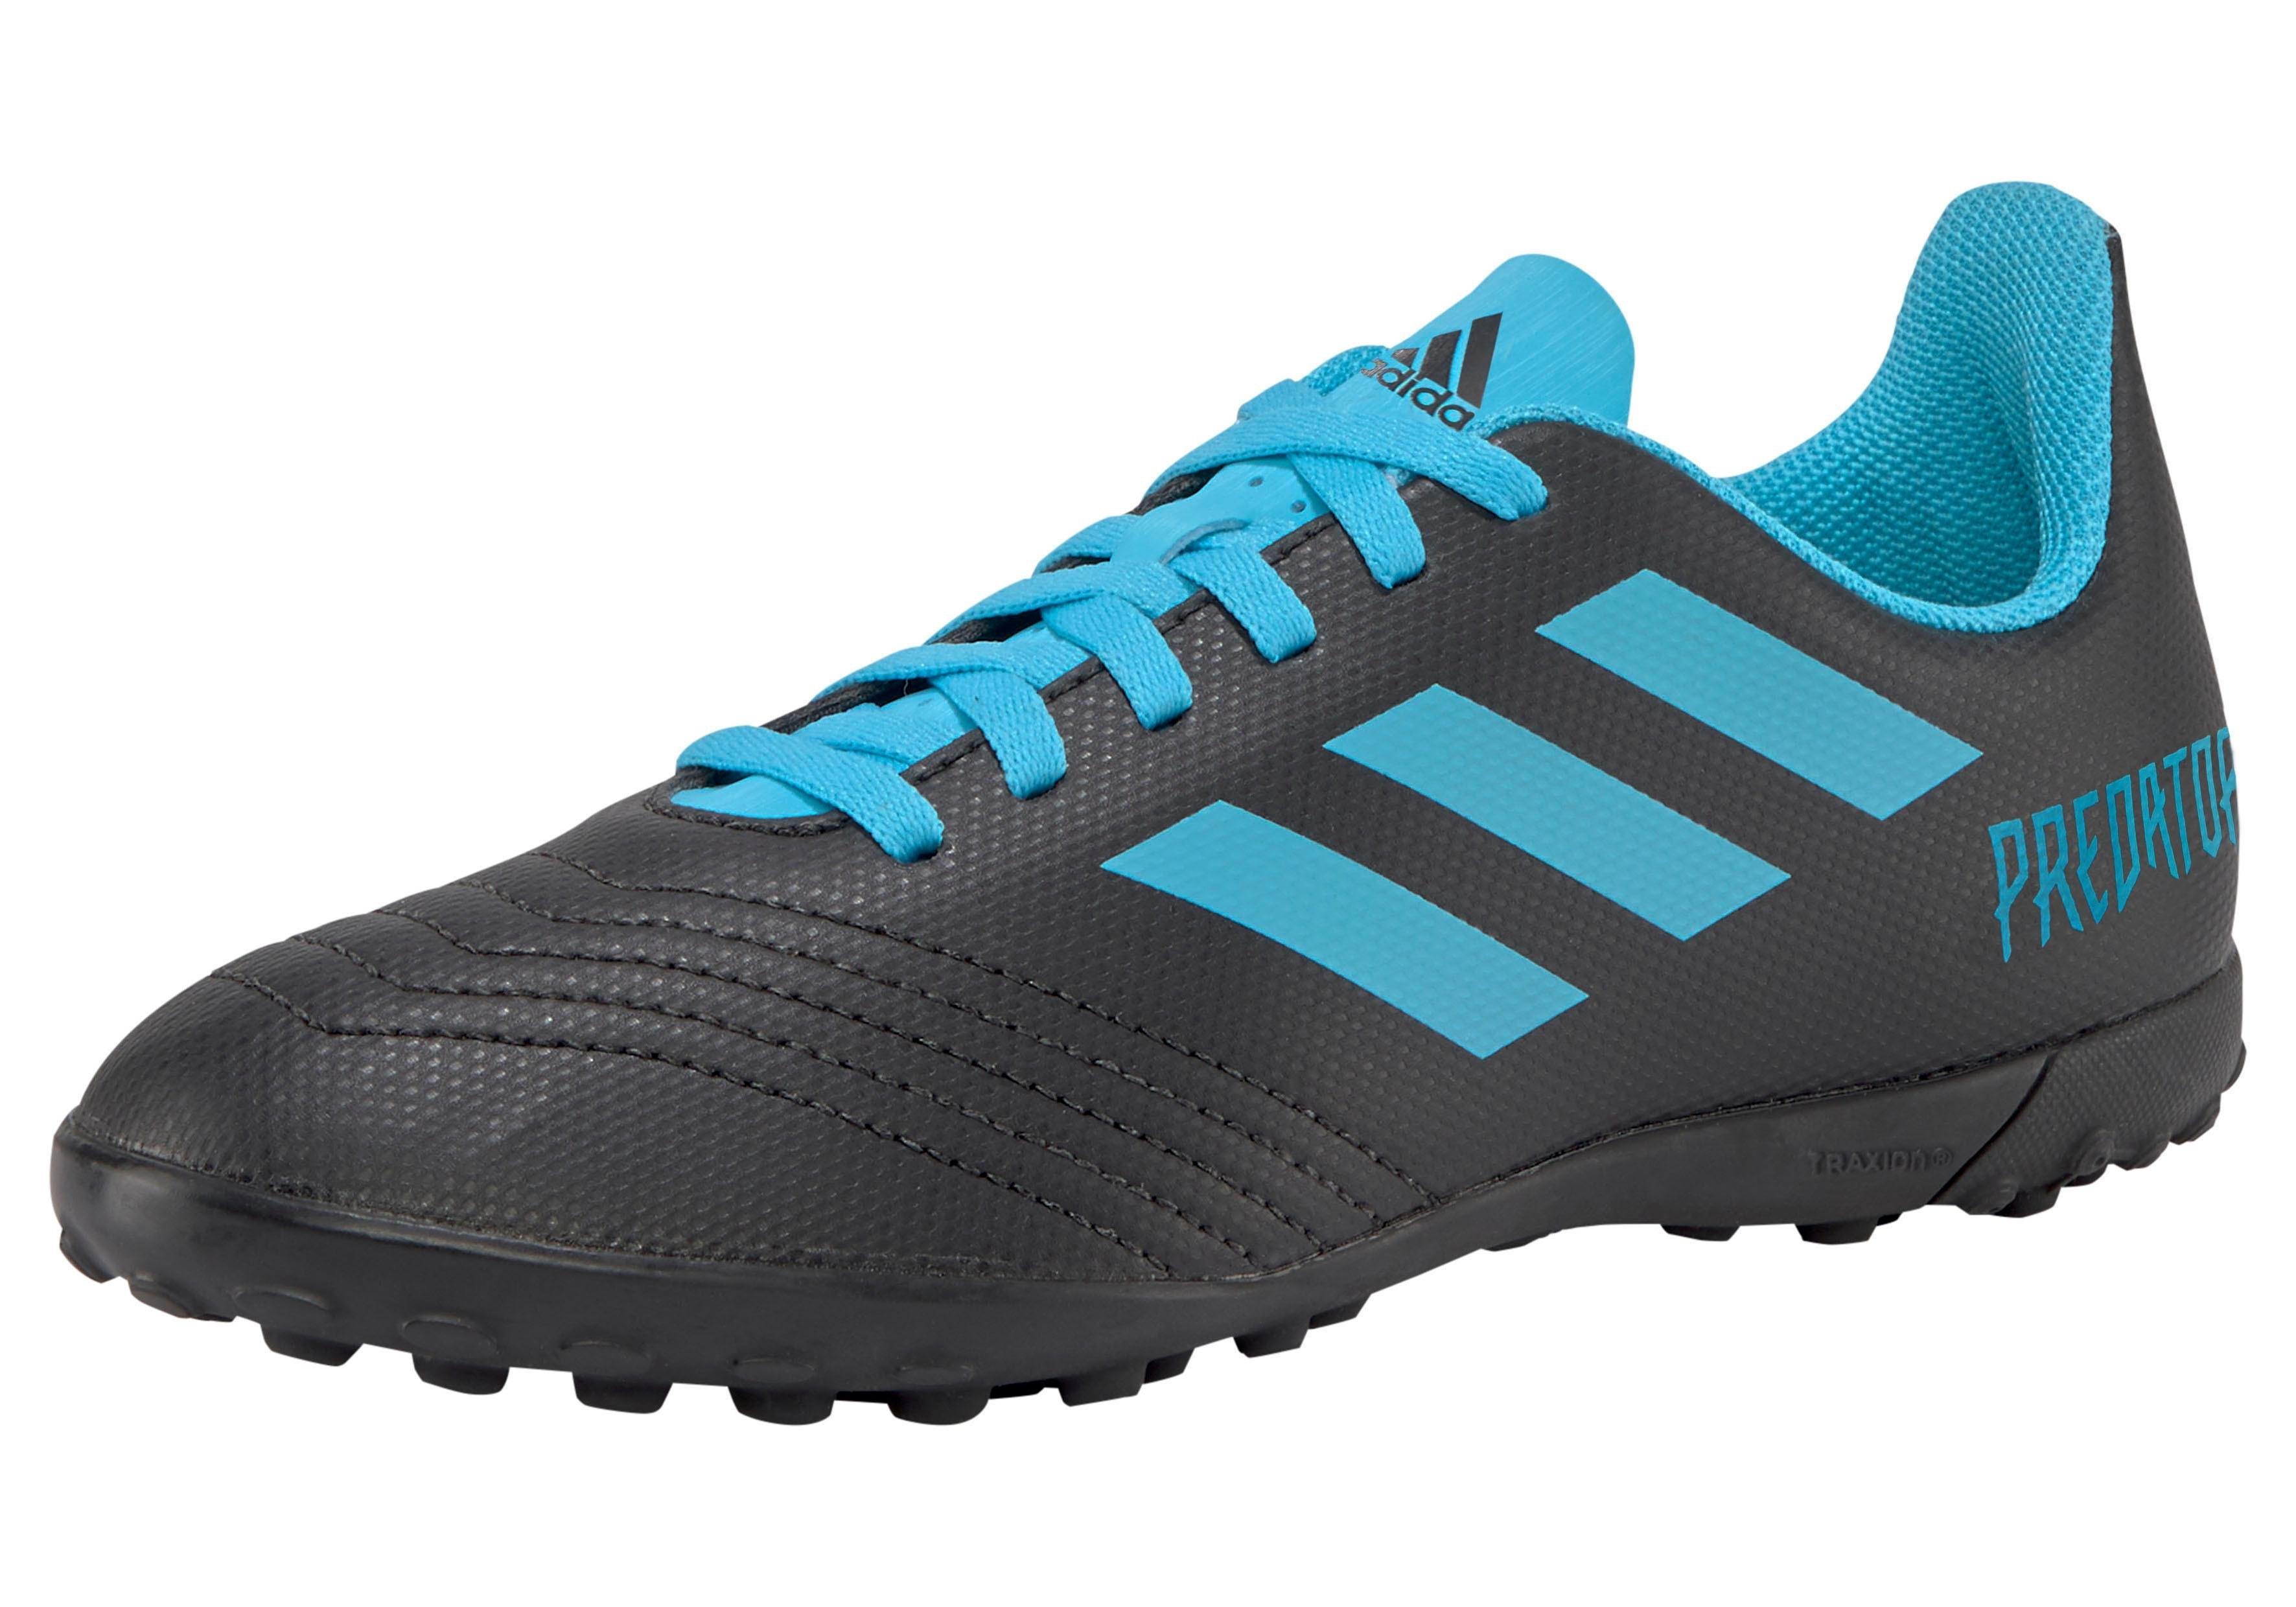 adidas Performance voetbalschoenen »Predator 19.4 TF Junior« - gratis ruilen op otto.nl